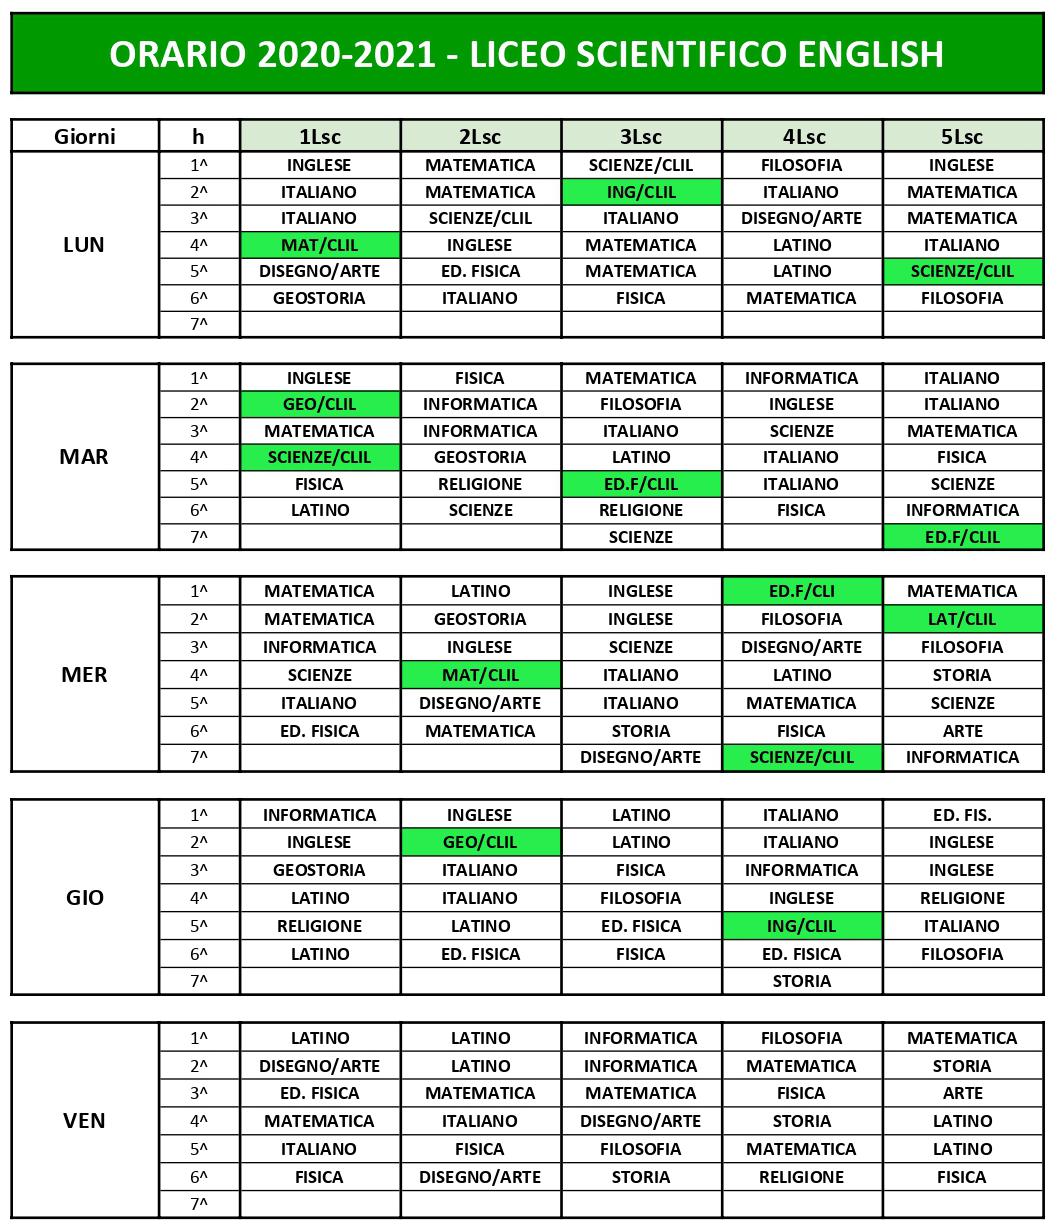 2020-21 Orario scolastico Liceo Scientifico English